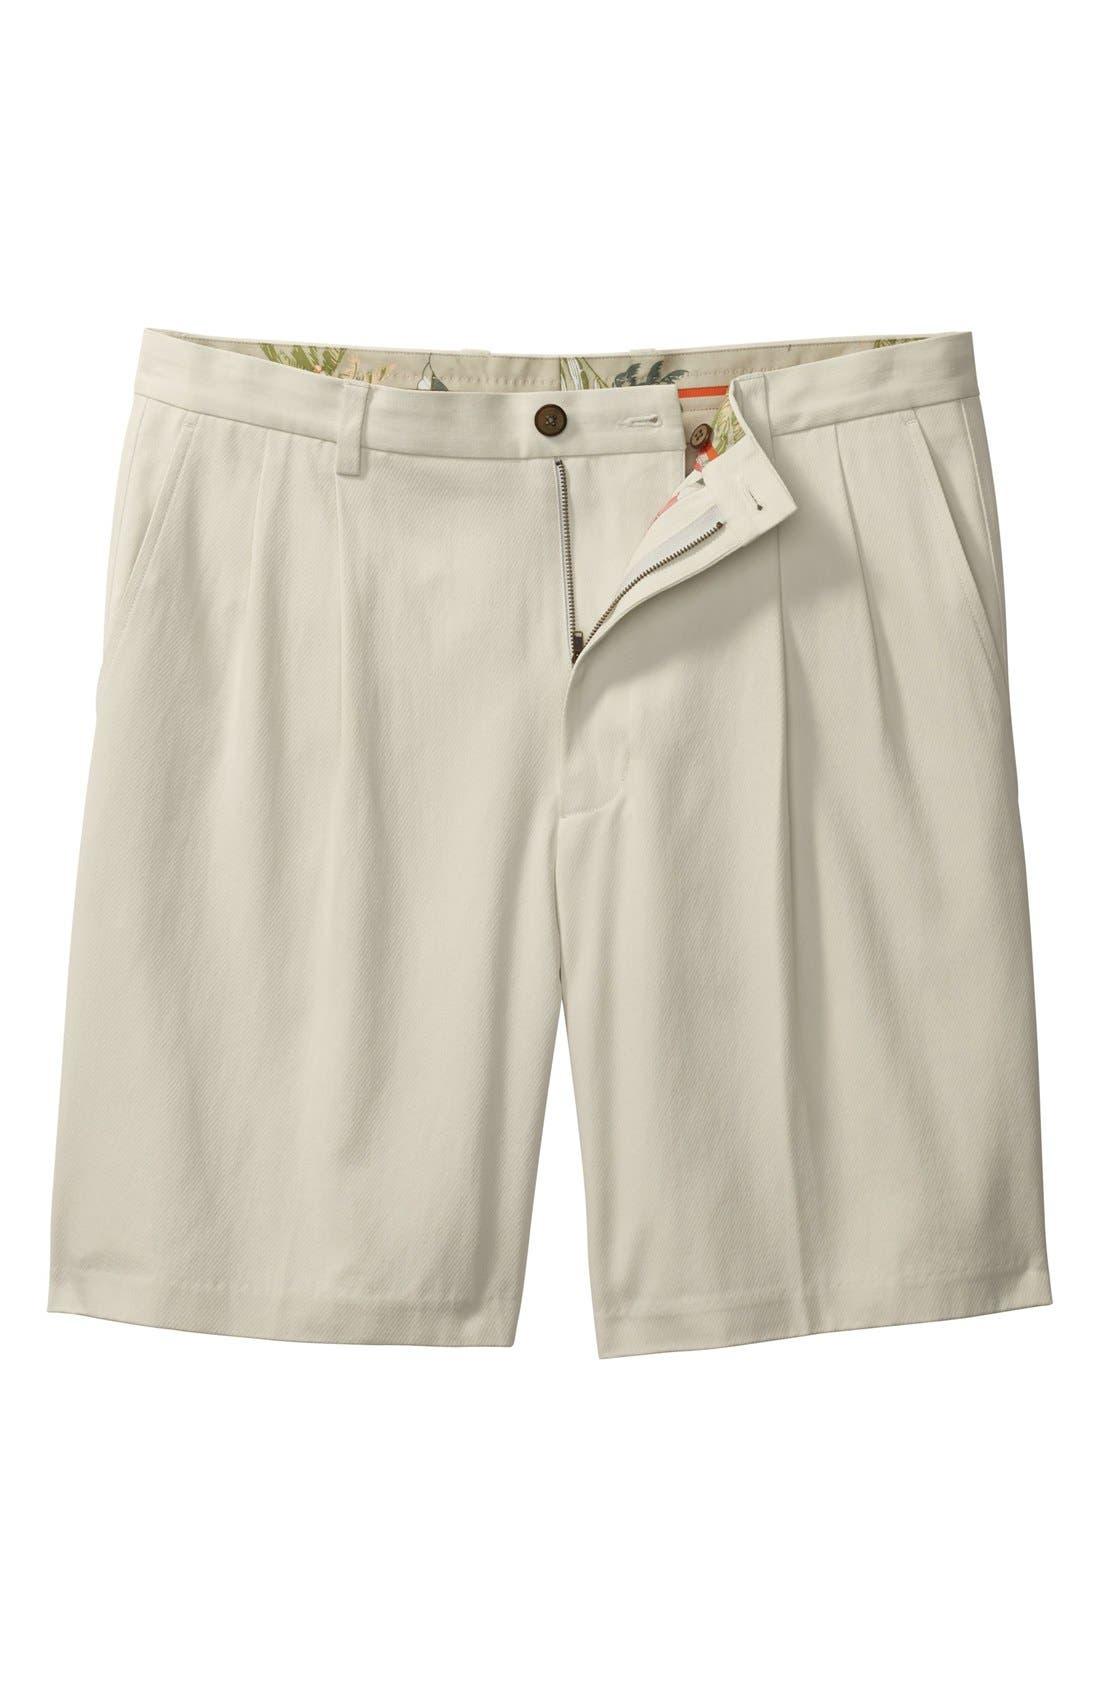 St. Thomas Pleated Shorts,                             Alternate thumbnail 17, color,